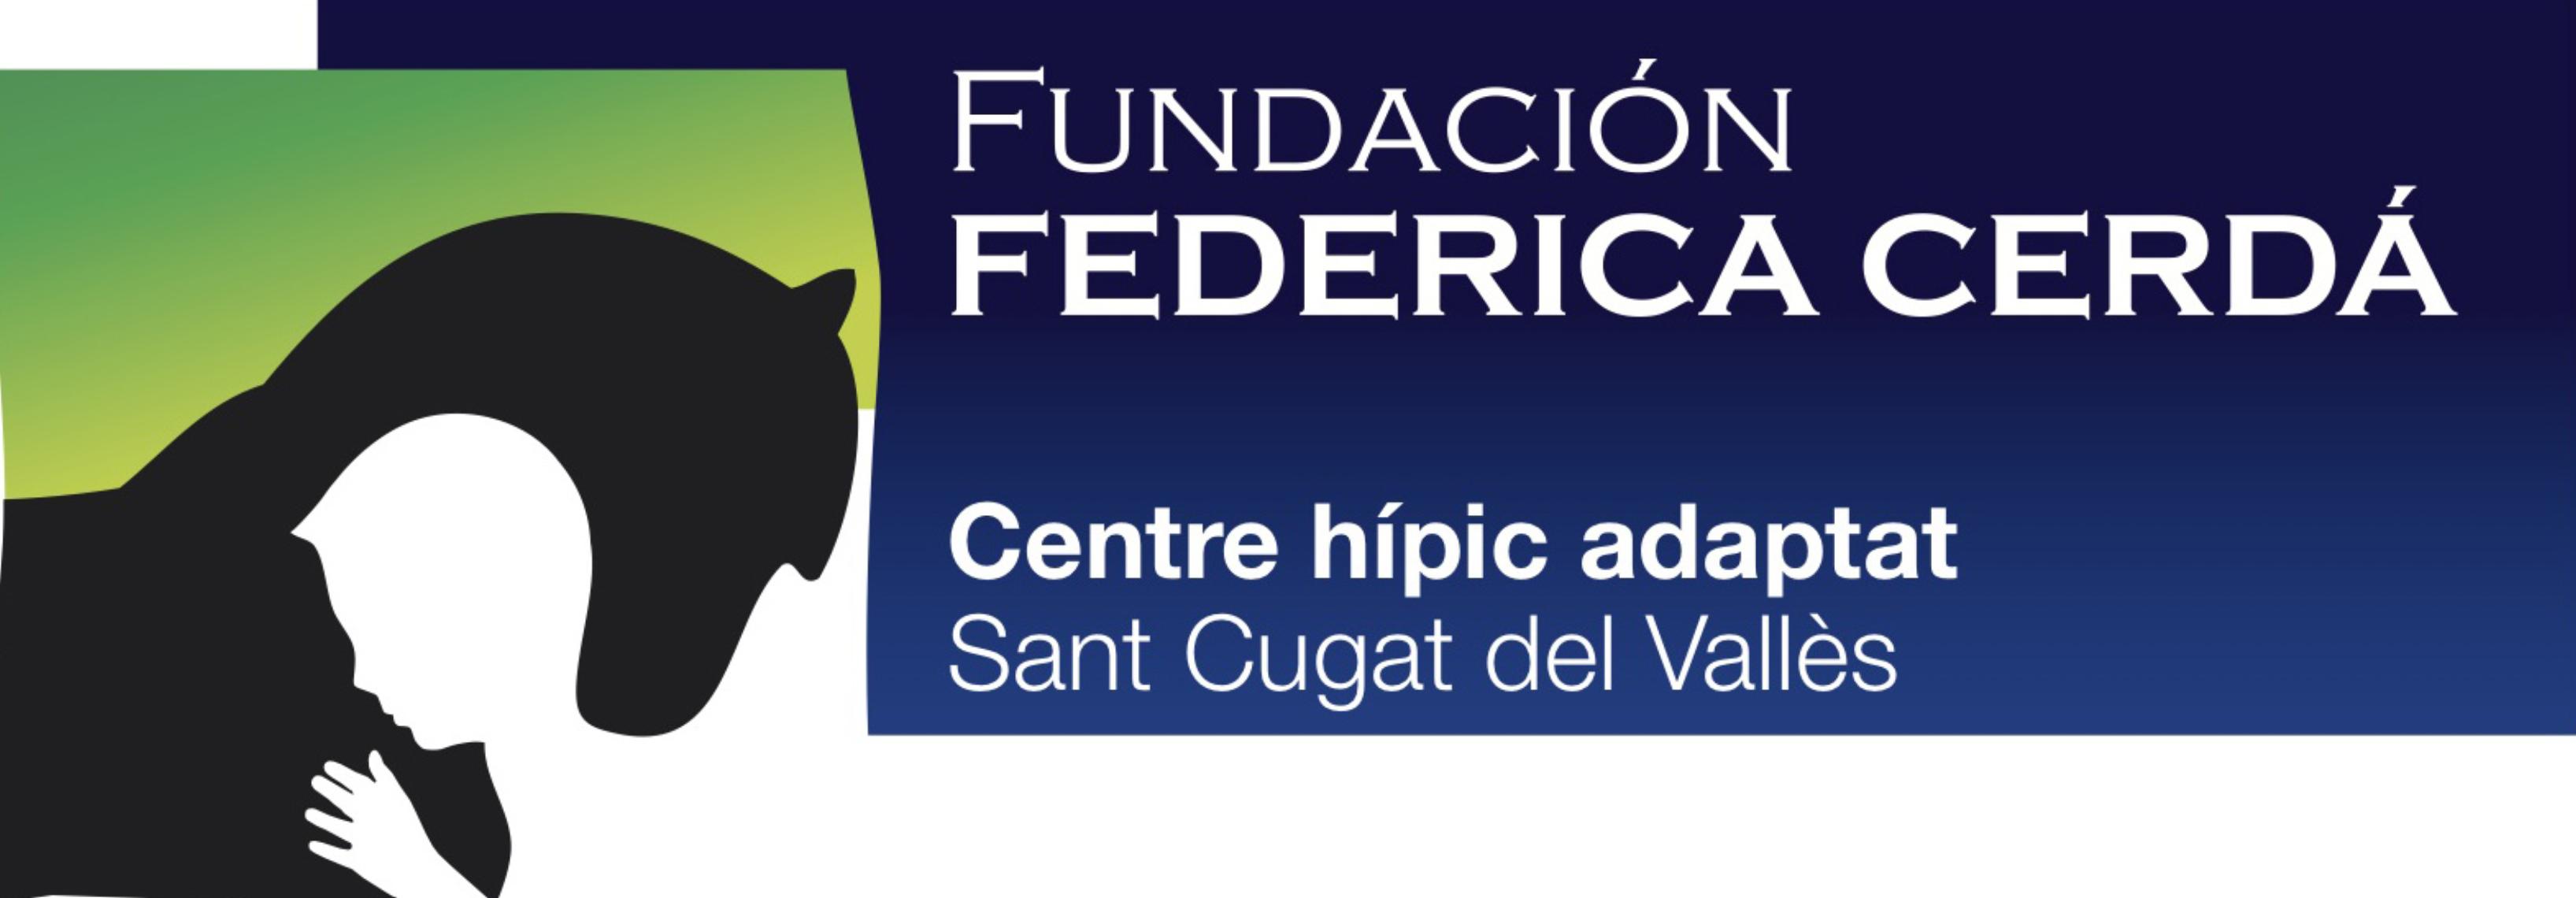 Fundación Federica Cerdà